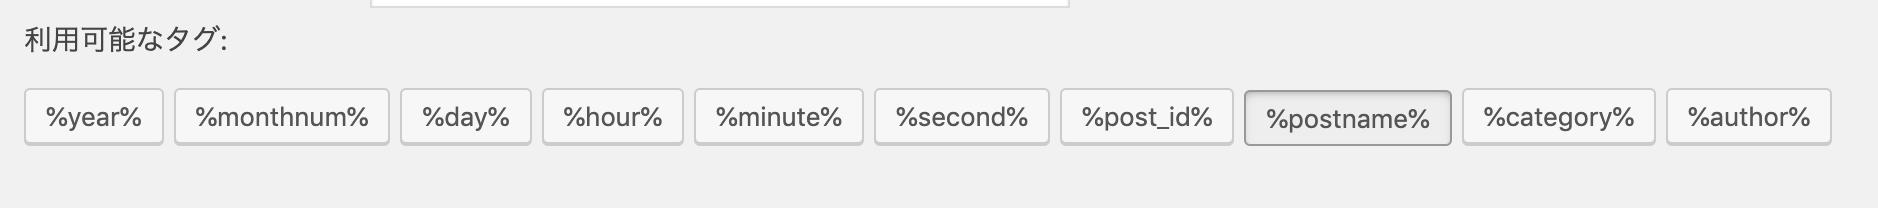 WordPress パーマリンク設定可能タグ一覧